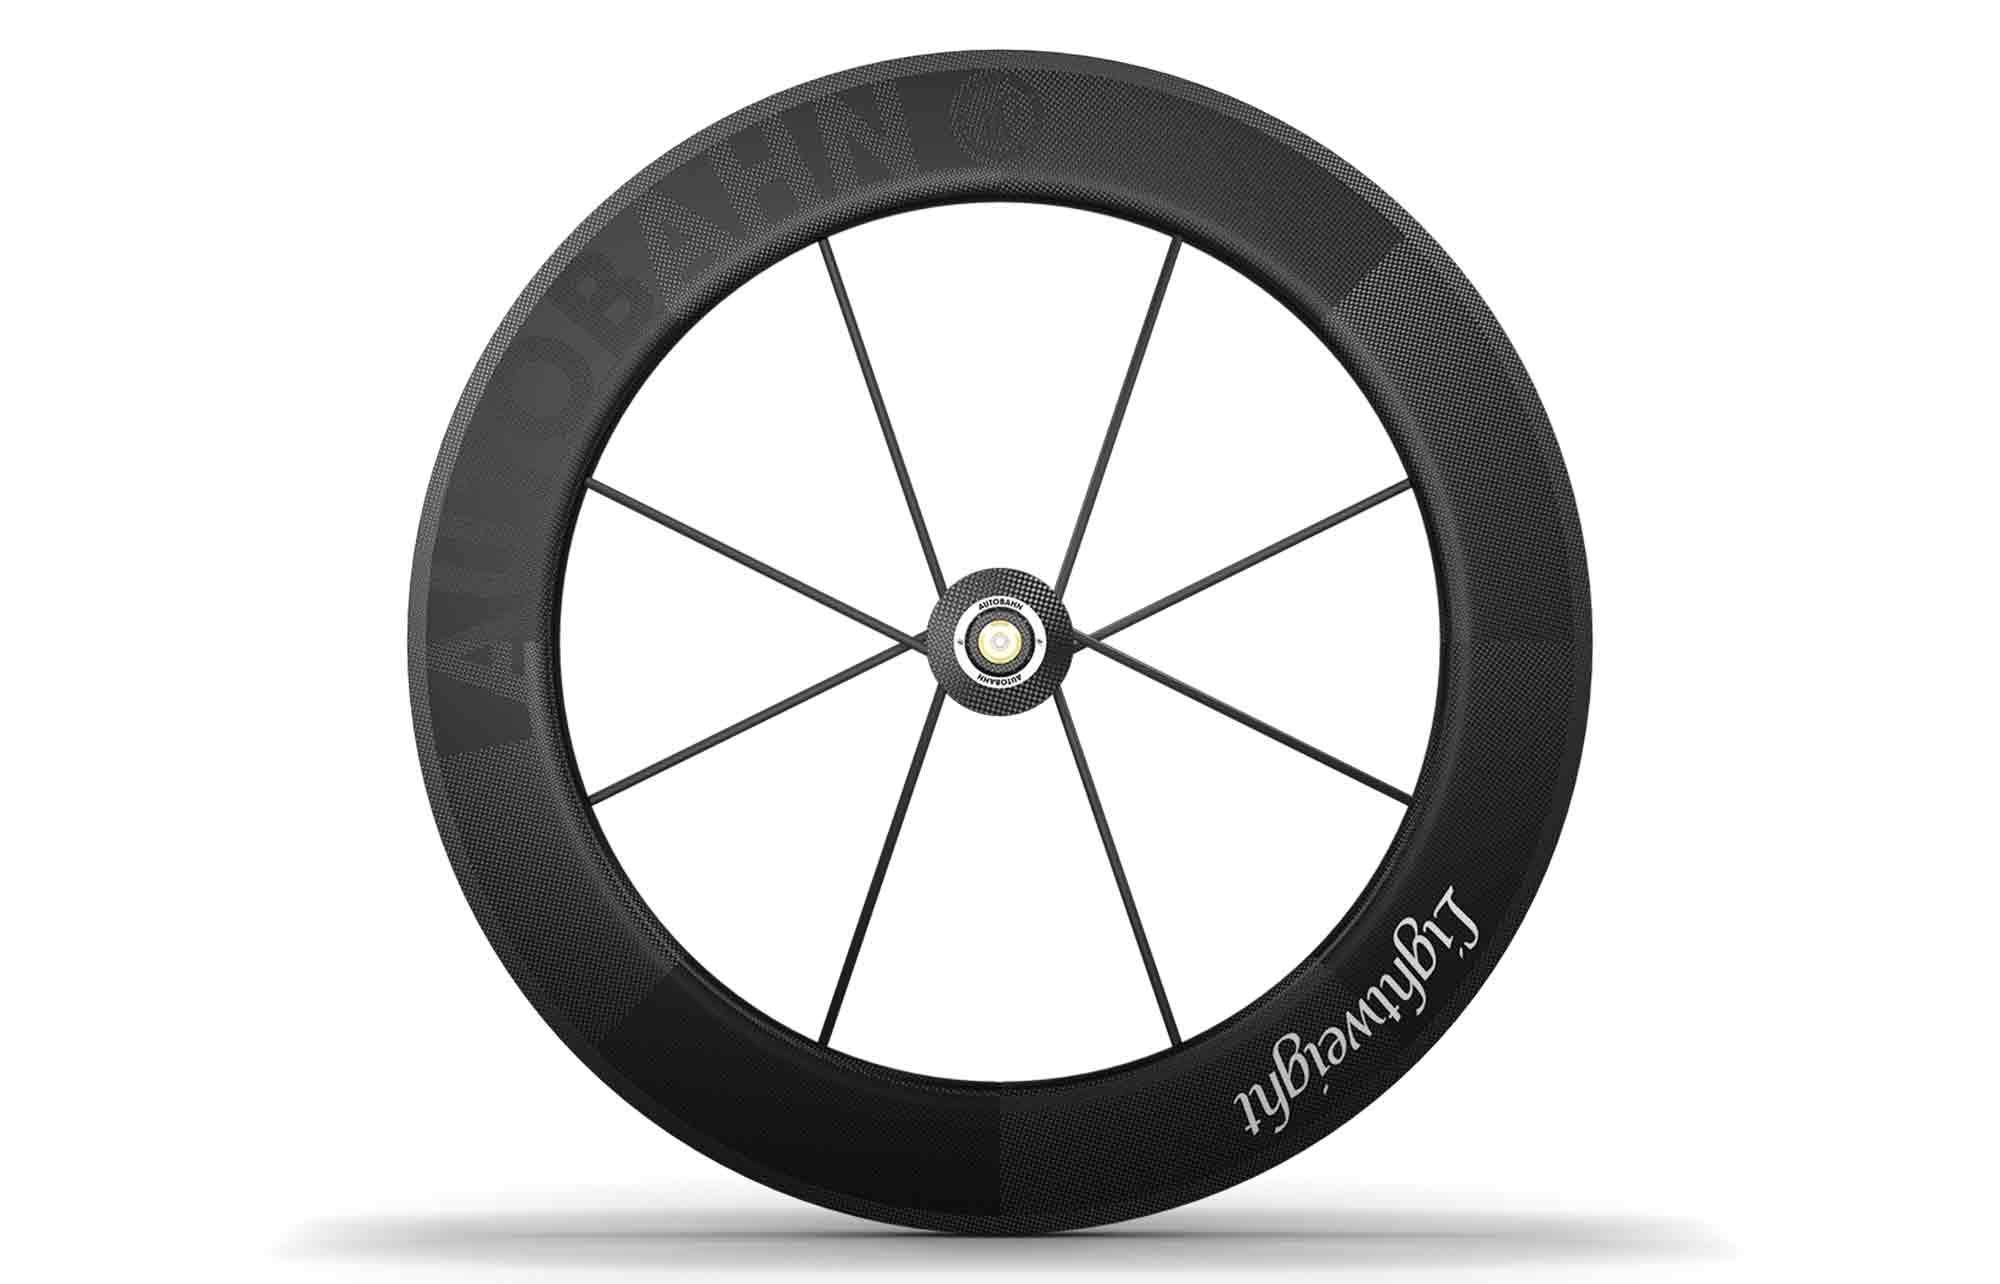 2018 Lightweight Autobahn Tubular Front Wheel  RA Cycles